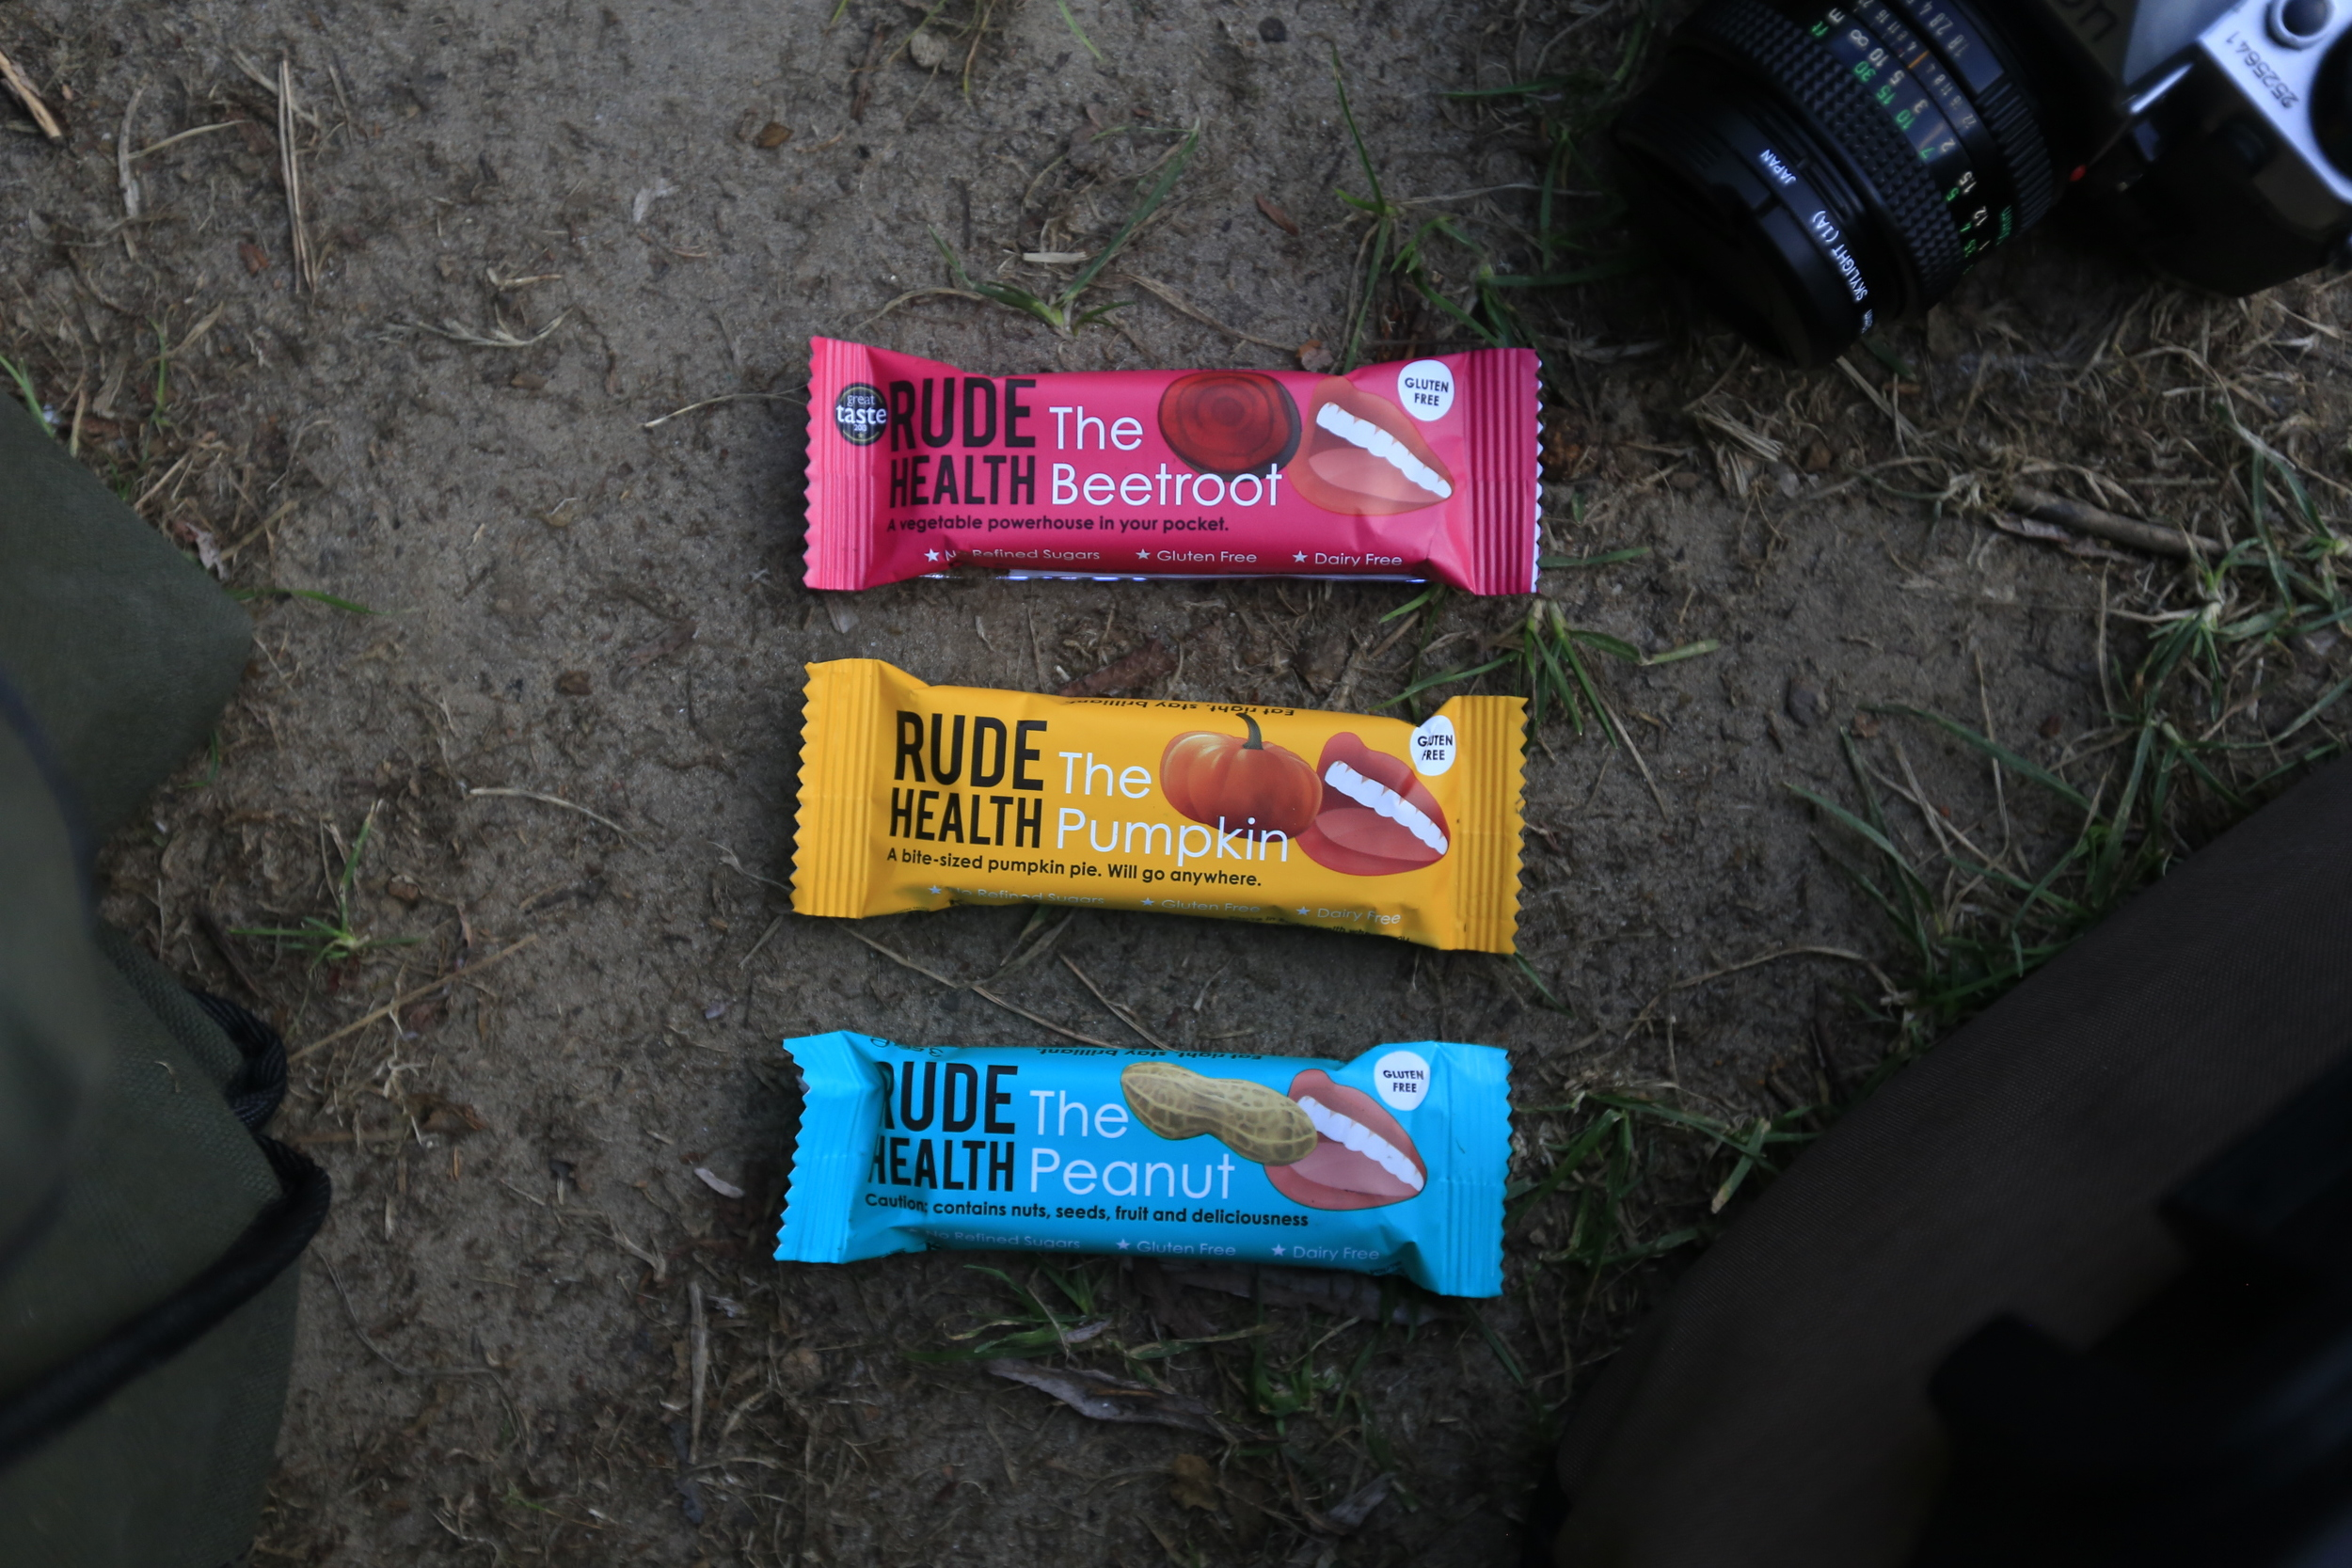 rude health, rude health bars, the beetroot, the pumpkin, the peanut, food, foodie, food blog, cycling blog, bikepacking blog, travel, travel blog, gear review, cycling food